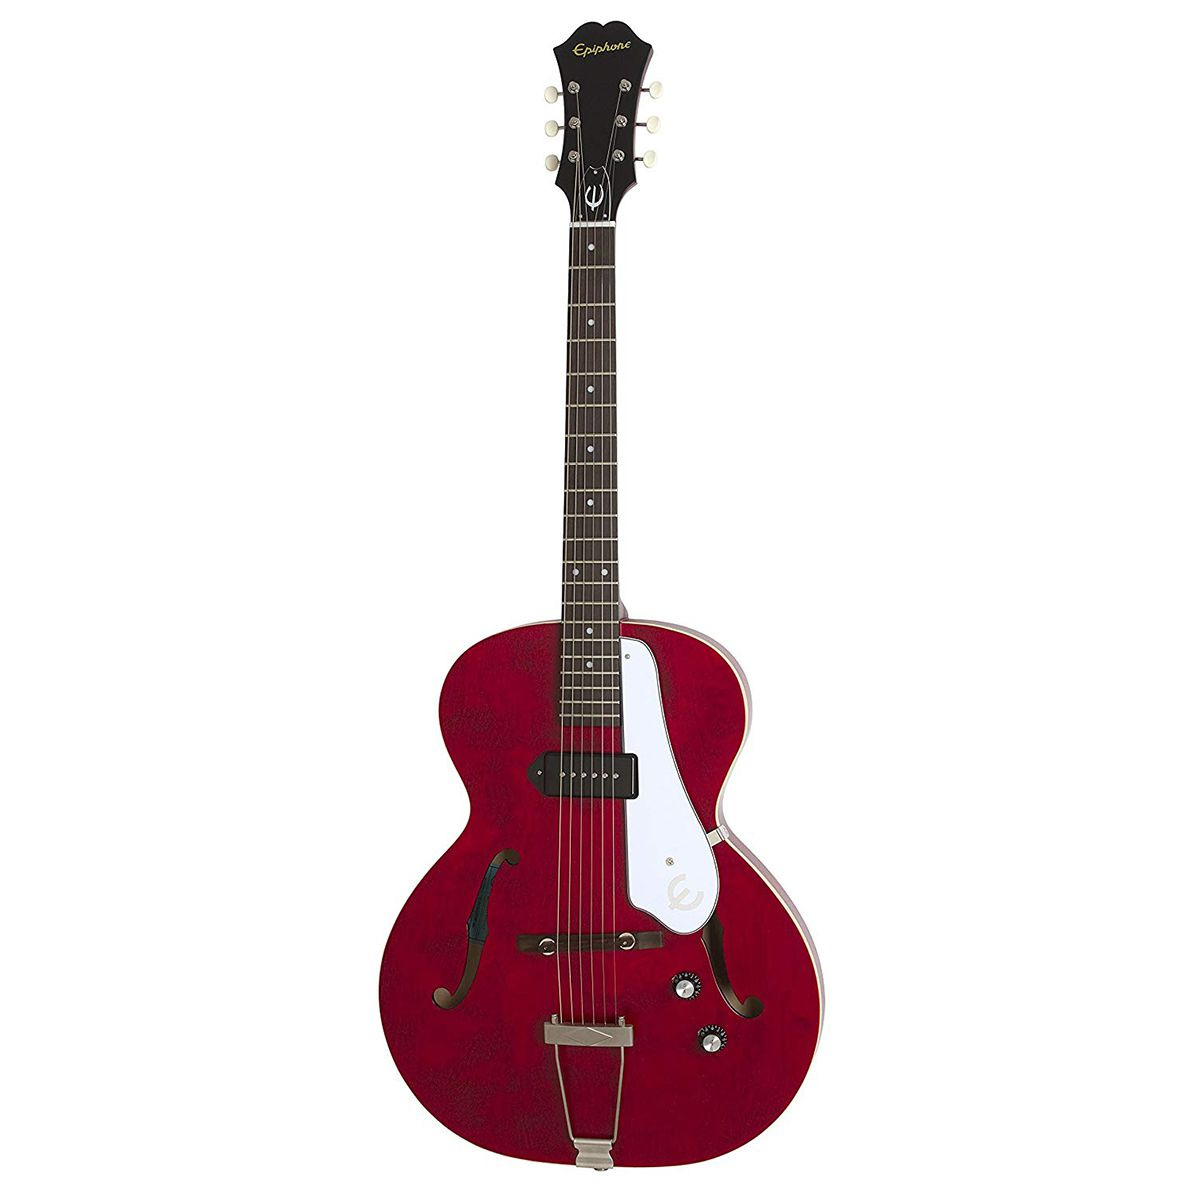 Guitarra Semi-Acústica Epiphone Century 1966 Gloss Cherry